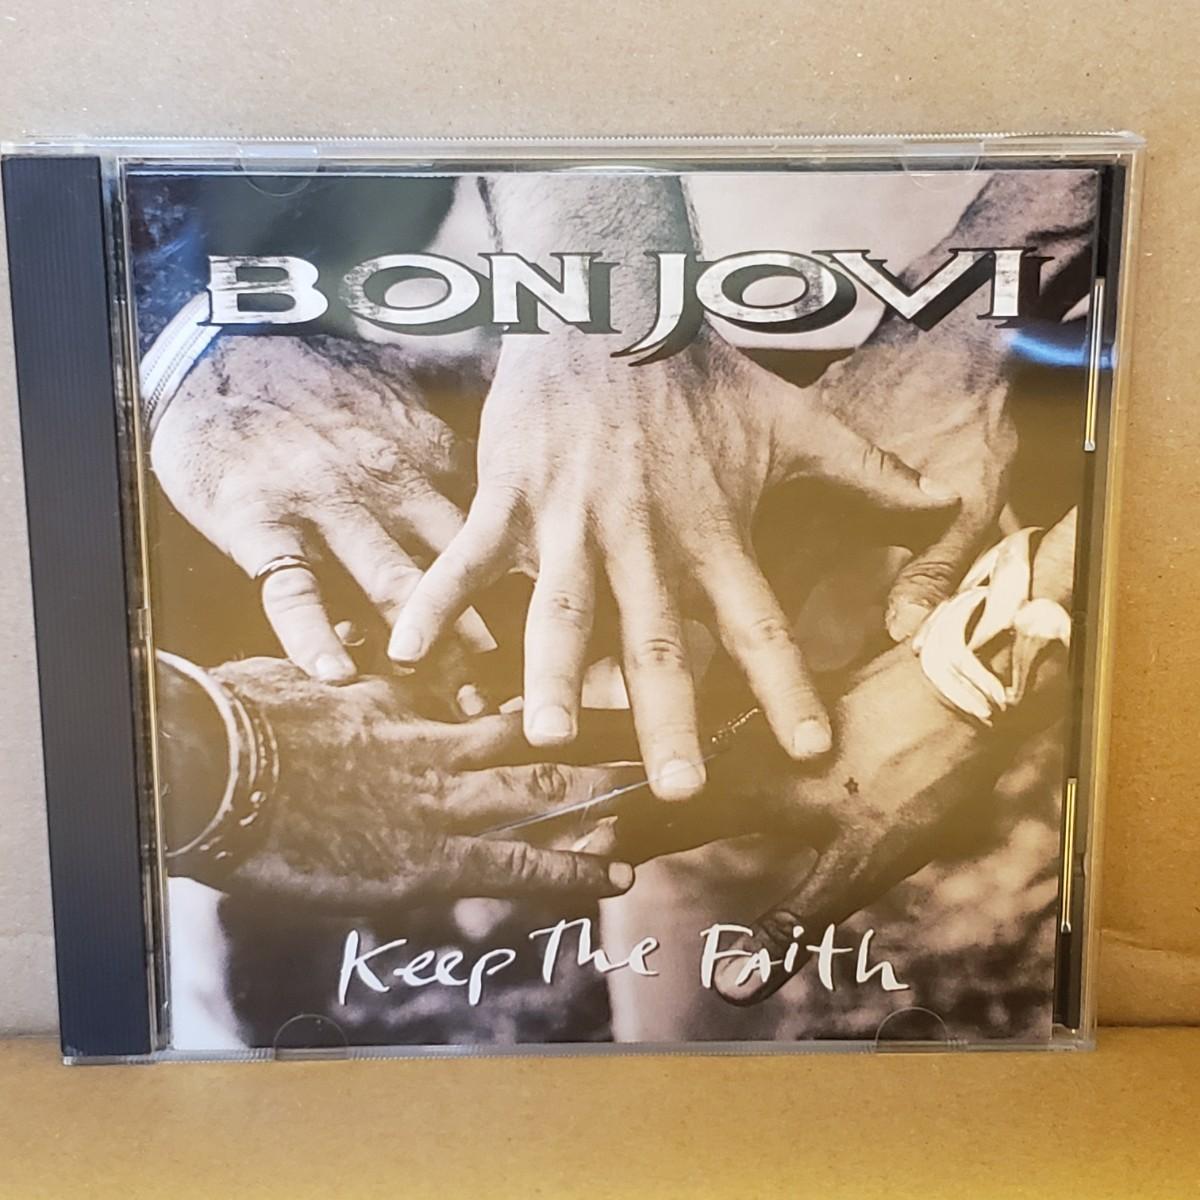 BON JOVI ボン・ジョヴィ KEEP THE FAITH